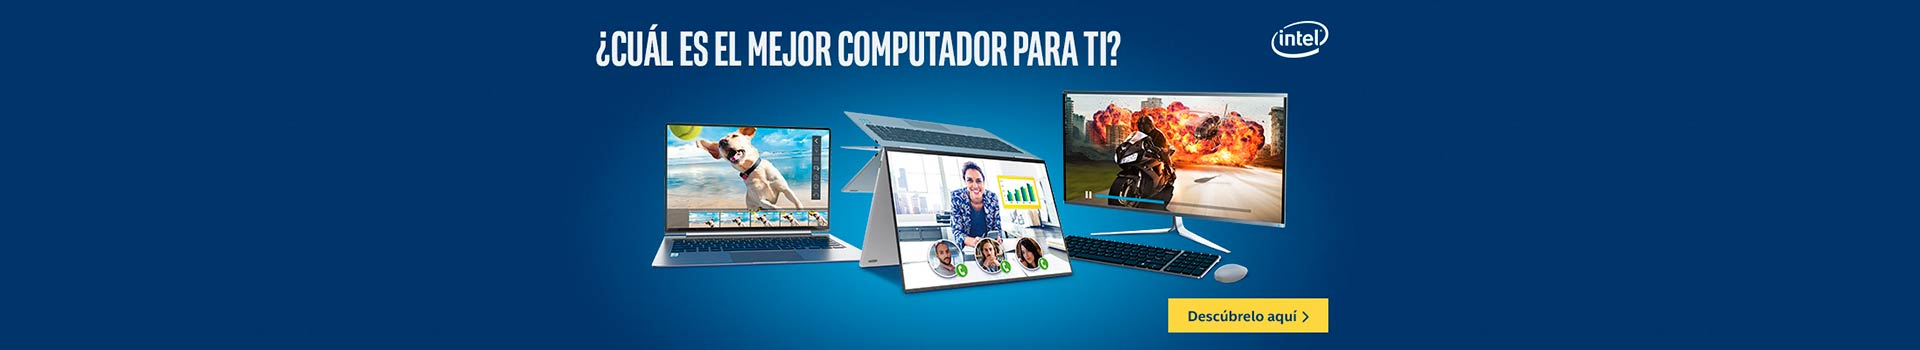 CAT KT INF - Mundo Intel - Jun 15